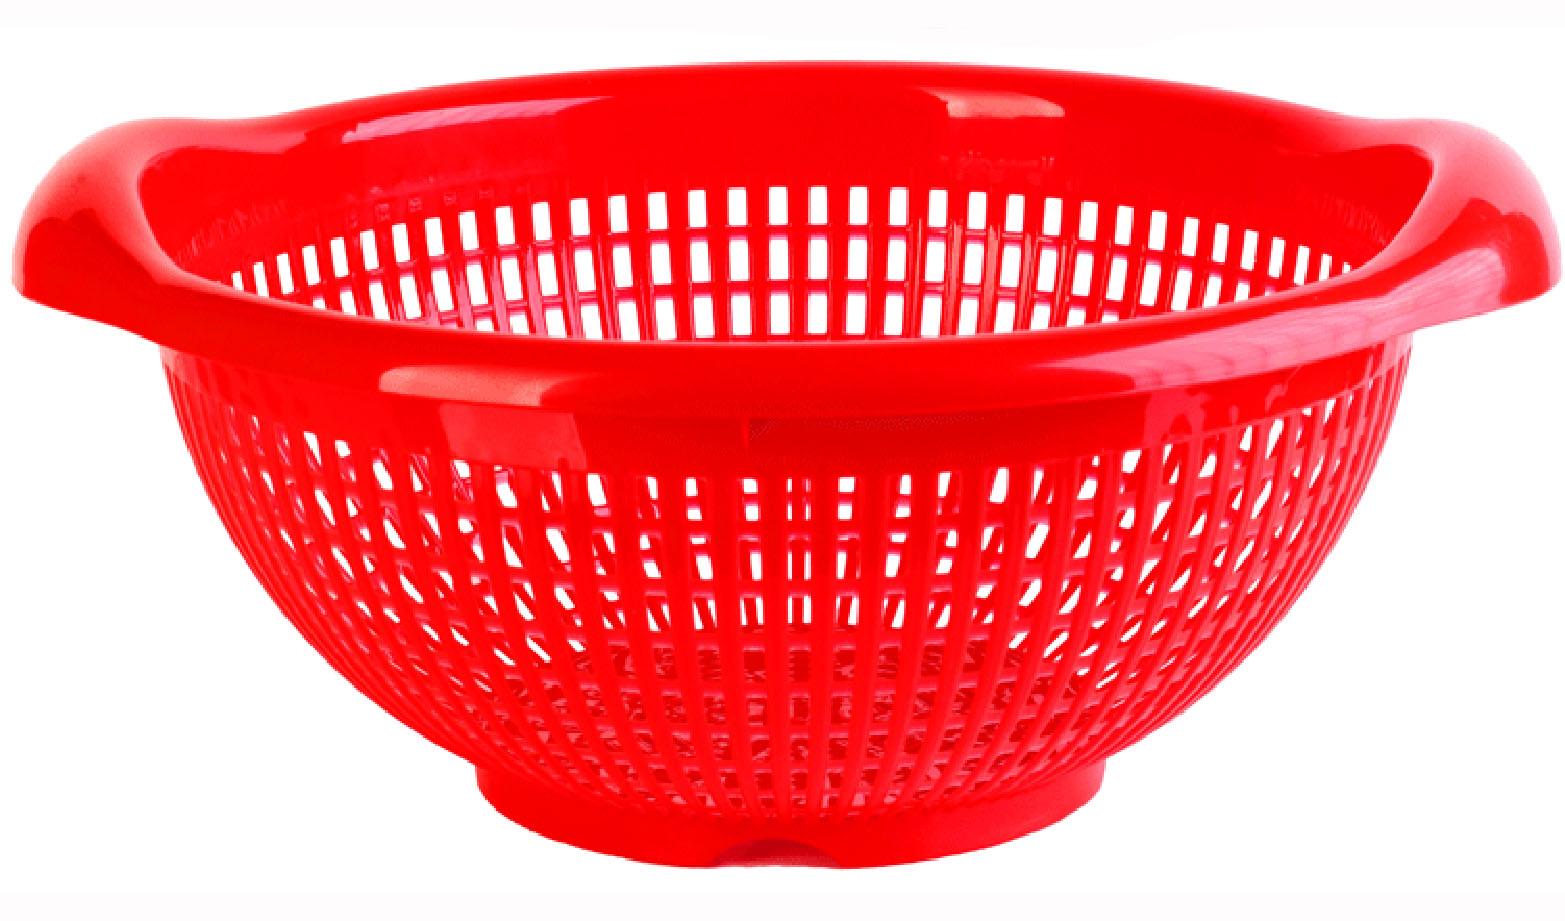 Дуршлаг круглый, КрасныйМ 1131Дуршлаг круглый, Красный